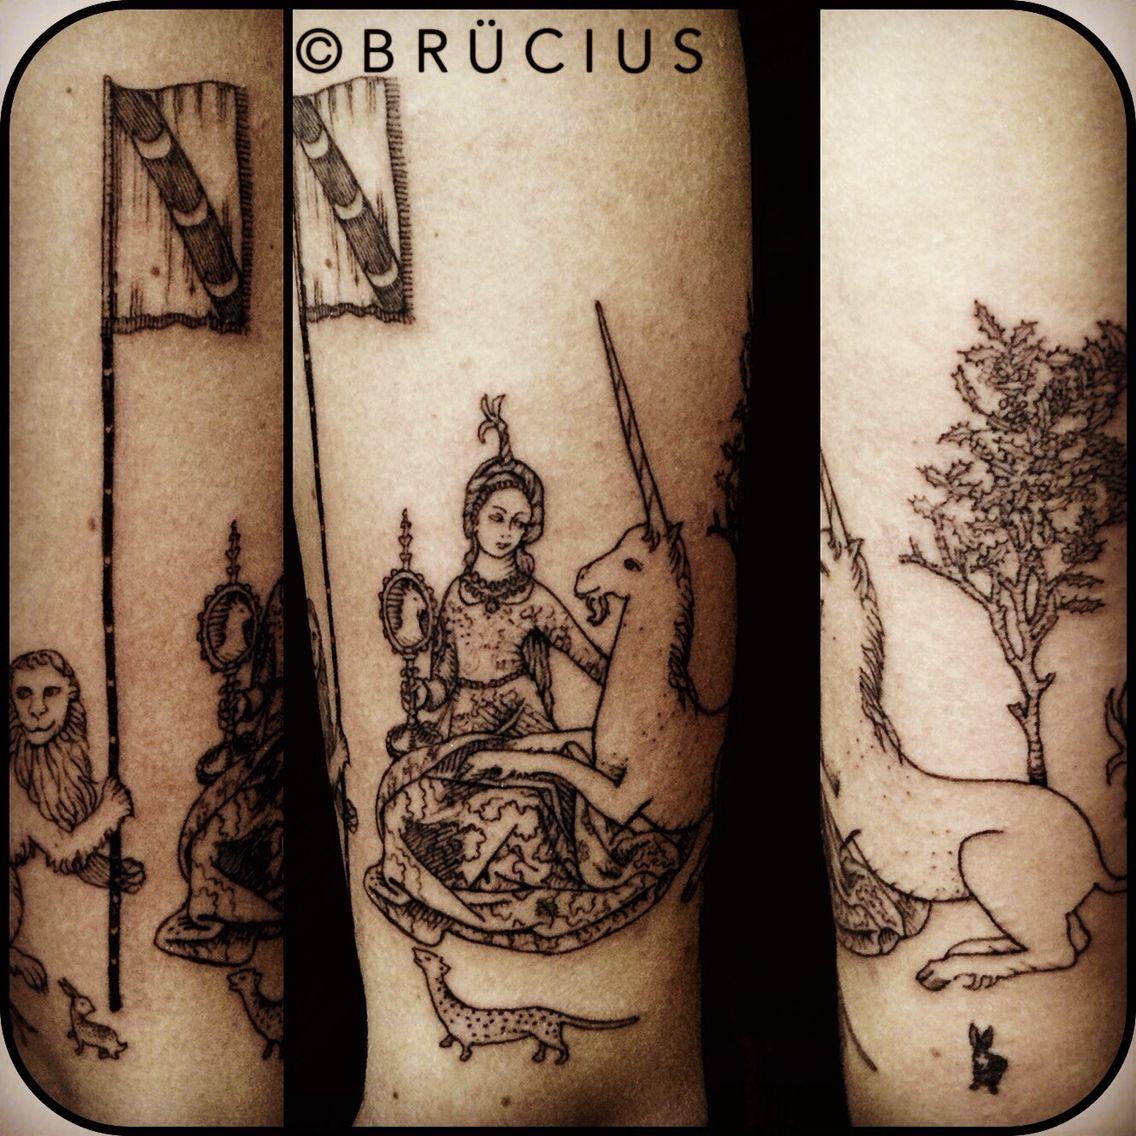 Brucius Tattoo Sf Sanfrancisco Brucius Engraving Etching Dotwork Linework Blackwork Tapestry Lady Unic Left Arm Tattoos Unicorn Tapestries Tattoos